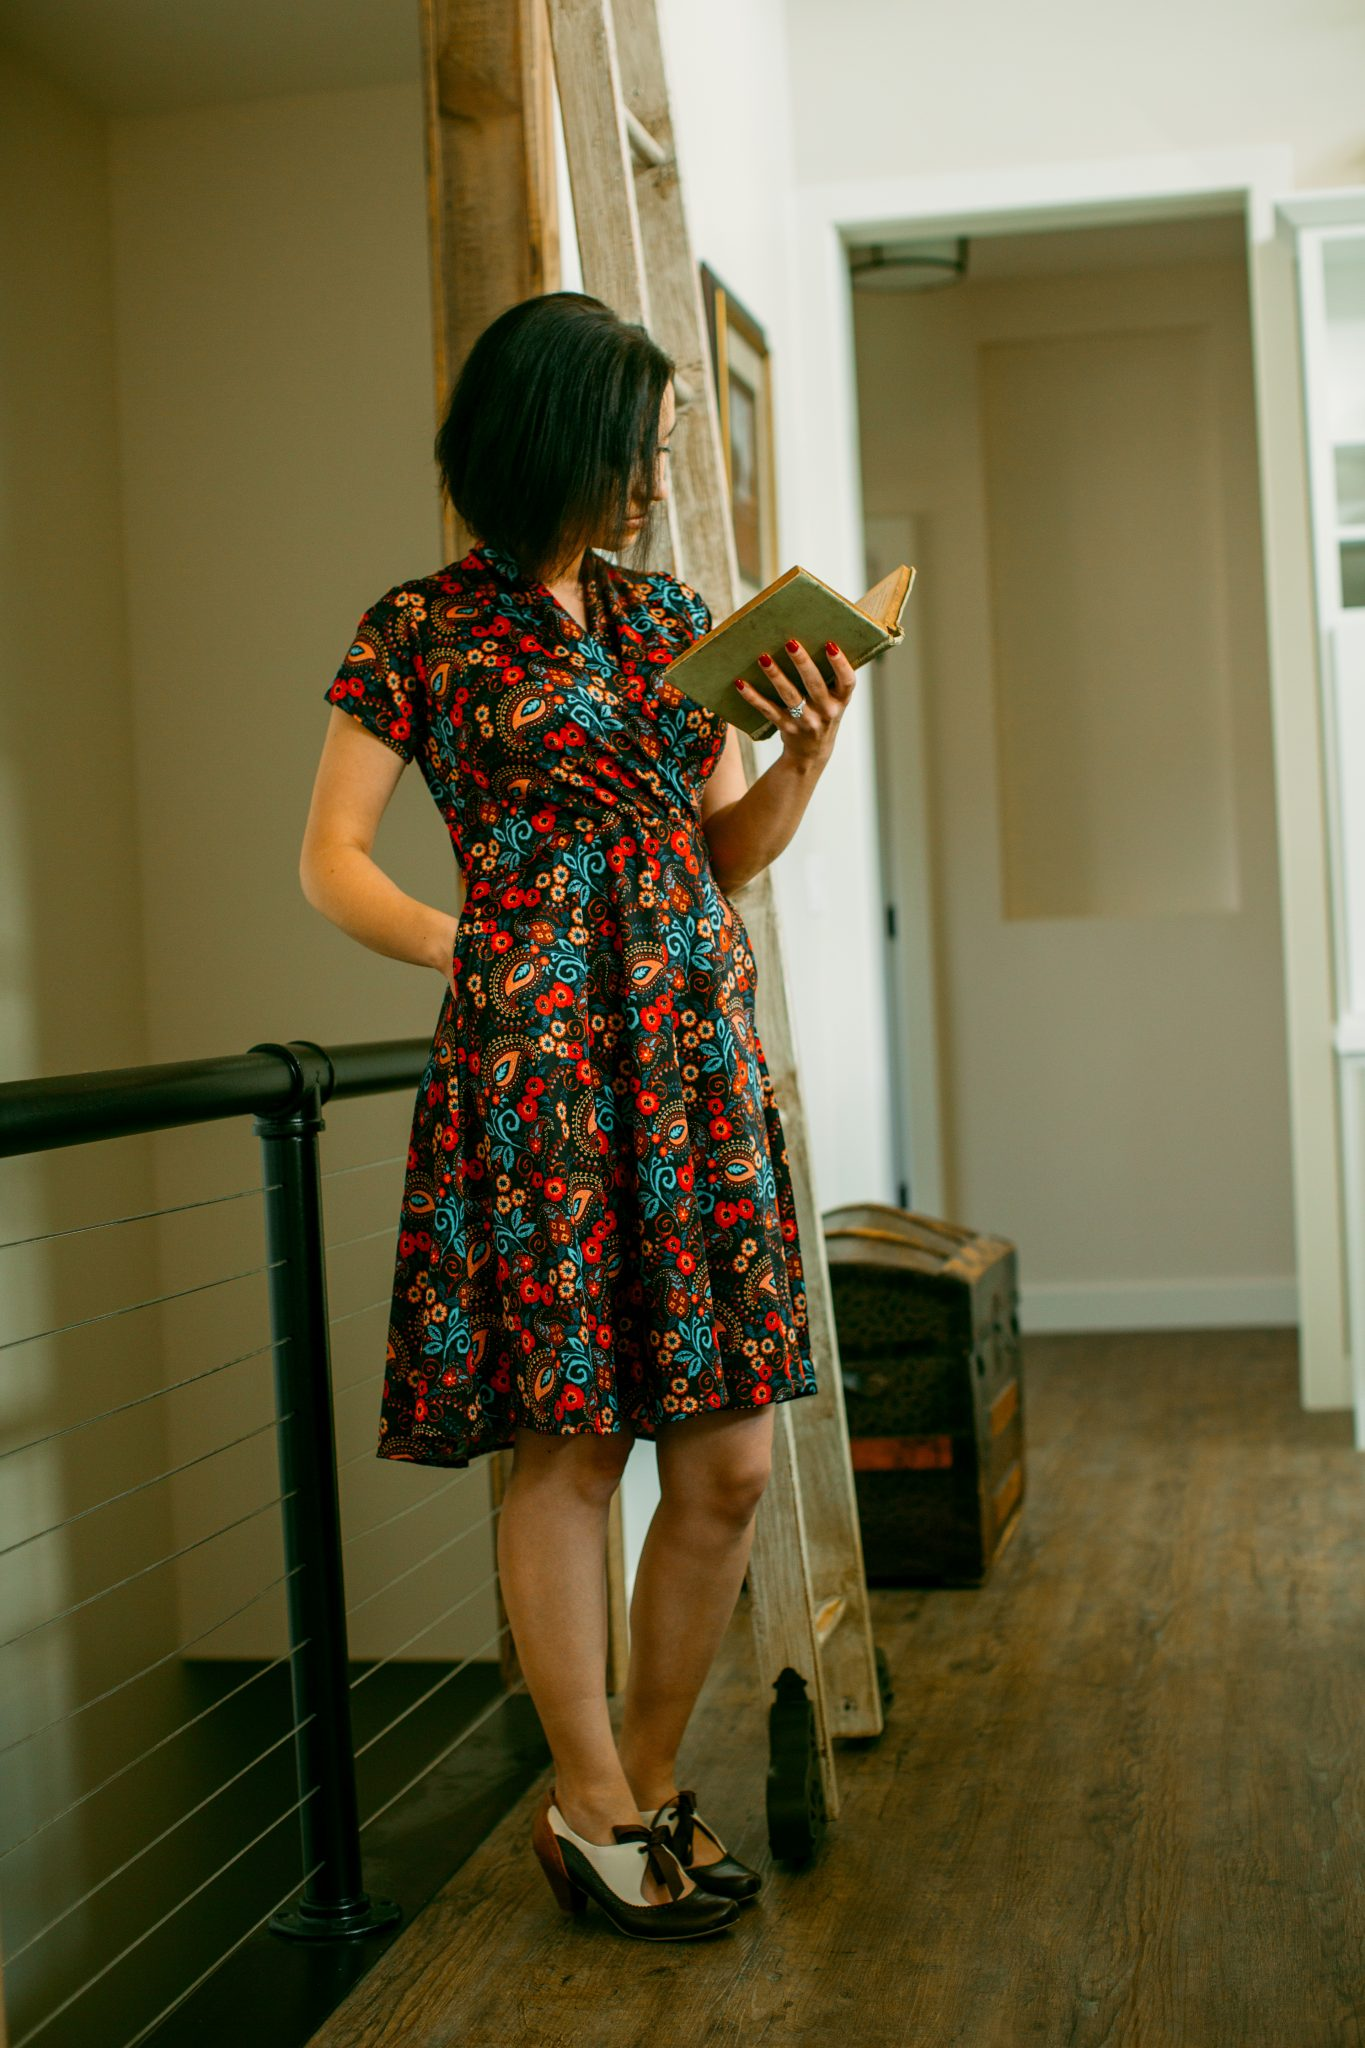 Joan Dress - Boho Vibes - Karina Dresses Review